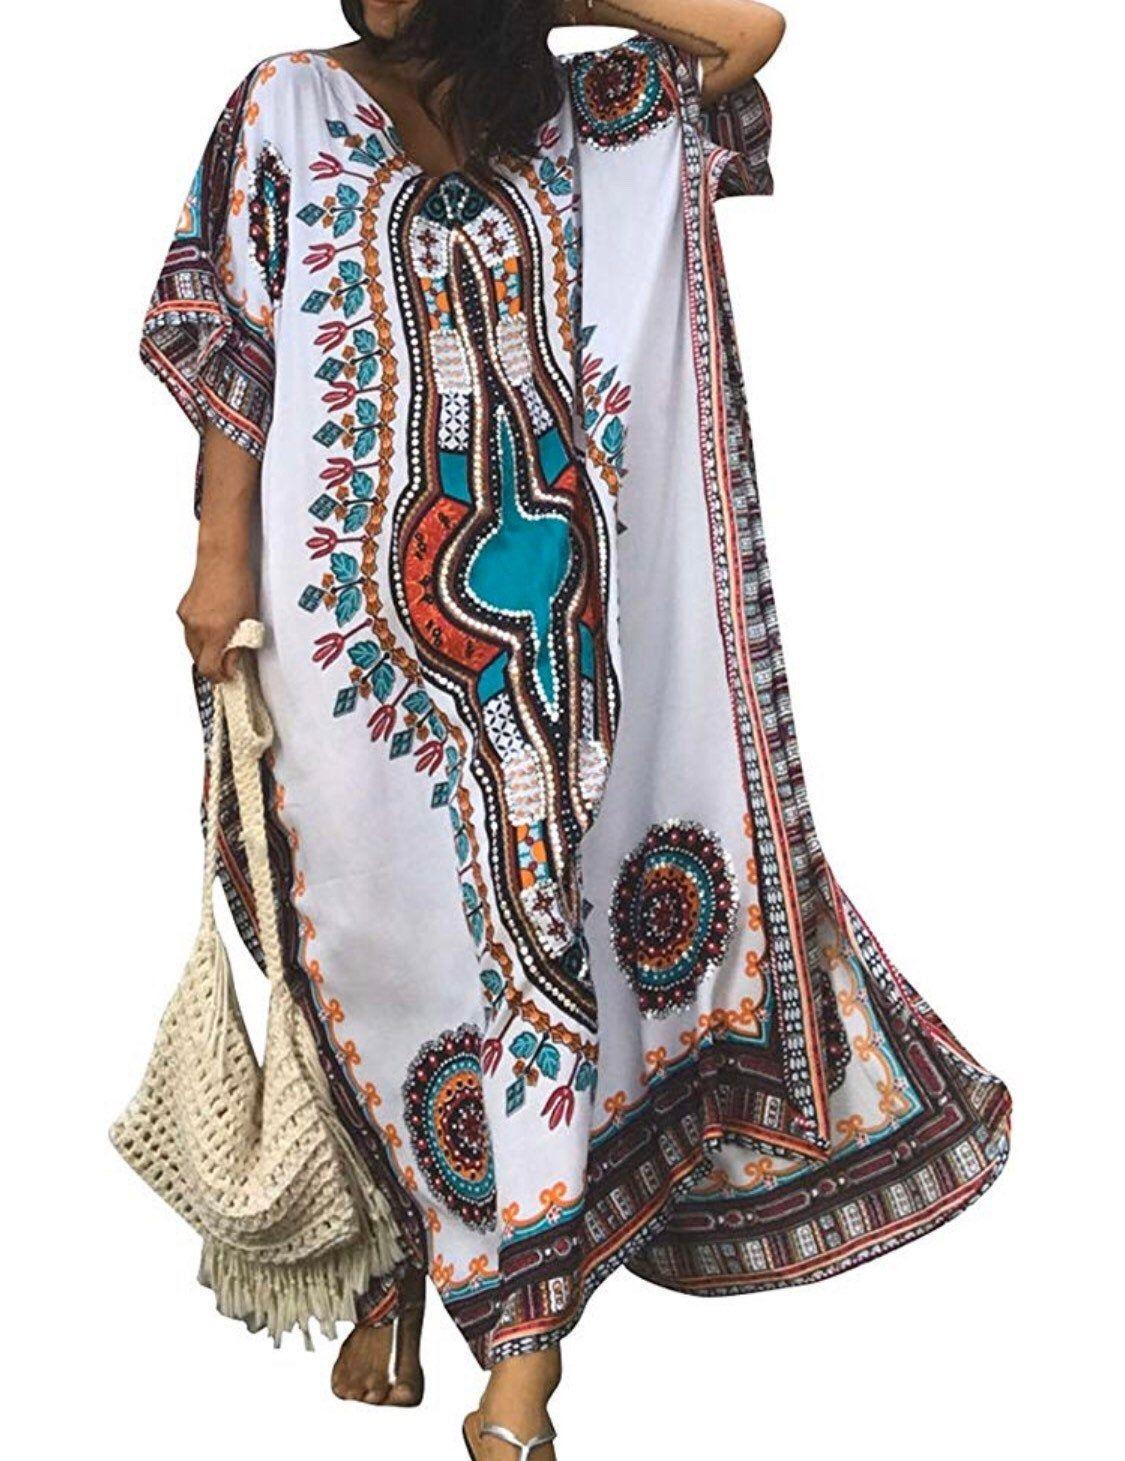 White And Brown Caftan For Women Women Caftan Kaftan For Girl Long Cardigan Women Clothing Ladies Cl Kaftan Maxi Dress Maxi Dress Summer Beach Beach Maxi Dress [ 1461 x 1125 Pixel ]